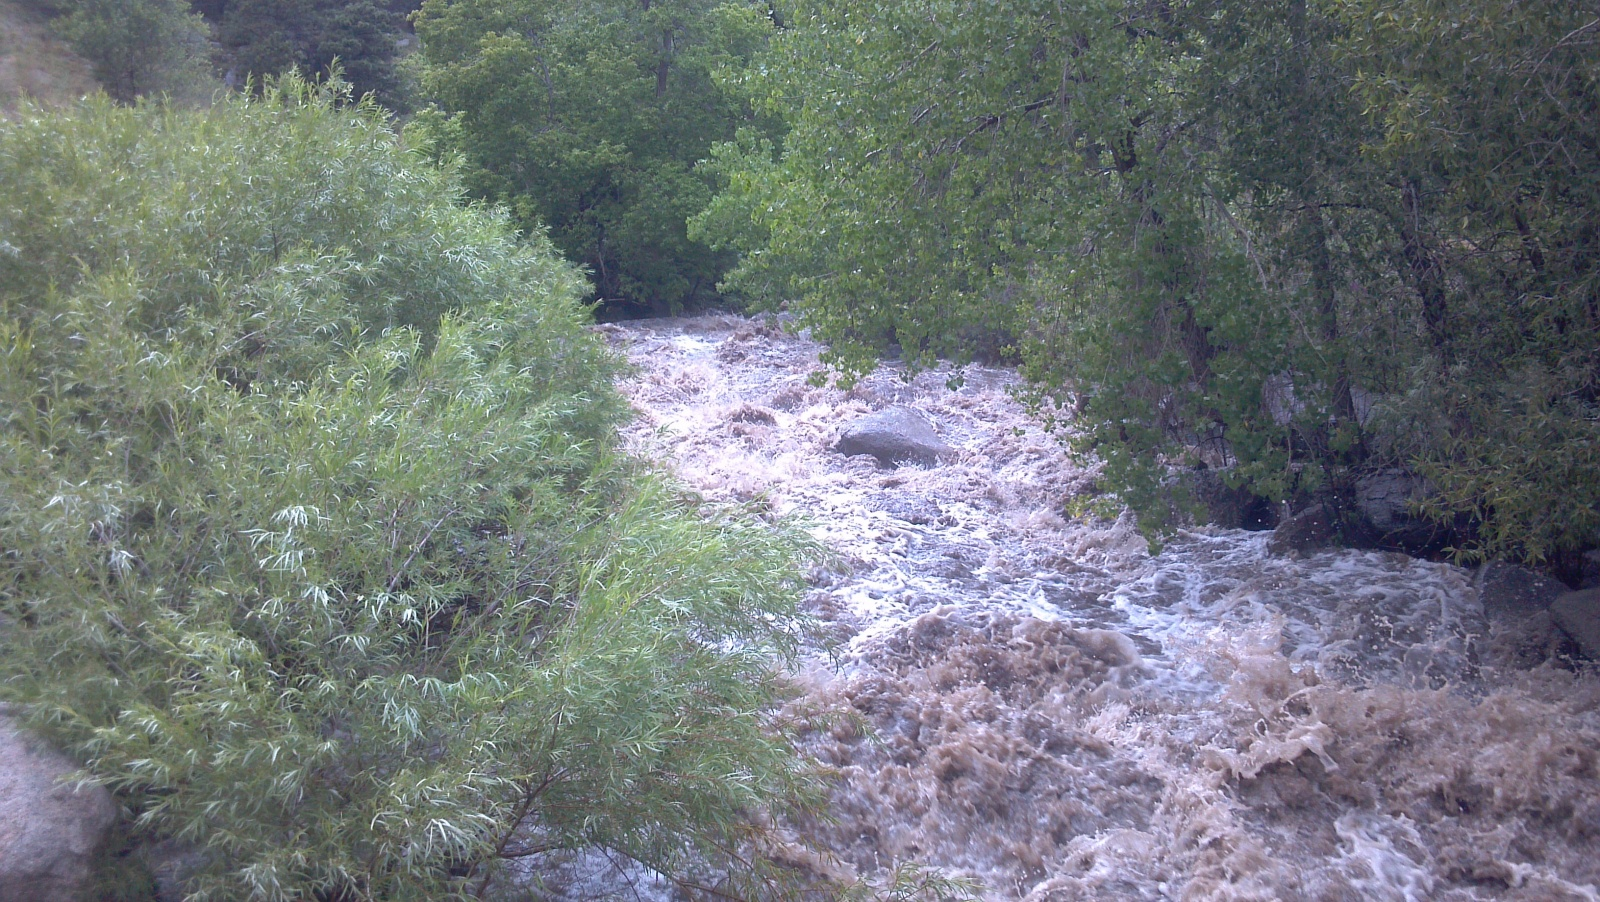 Click image for larger version  Name:boulder creek.jpg Views:187 Size:781.1 KB ID:3840